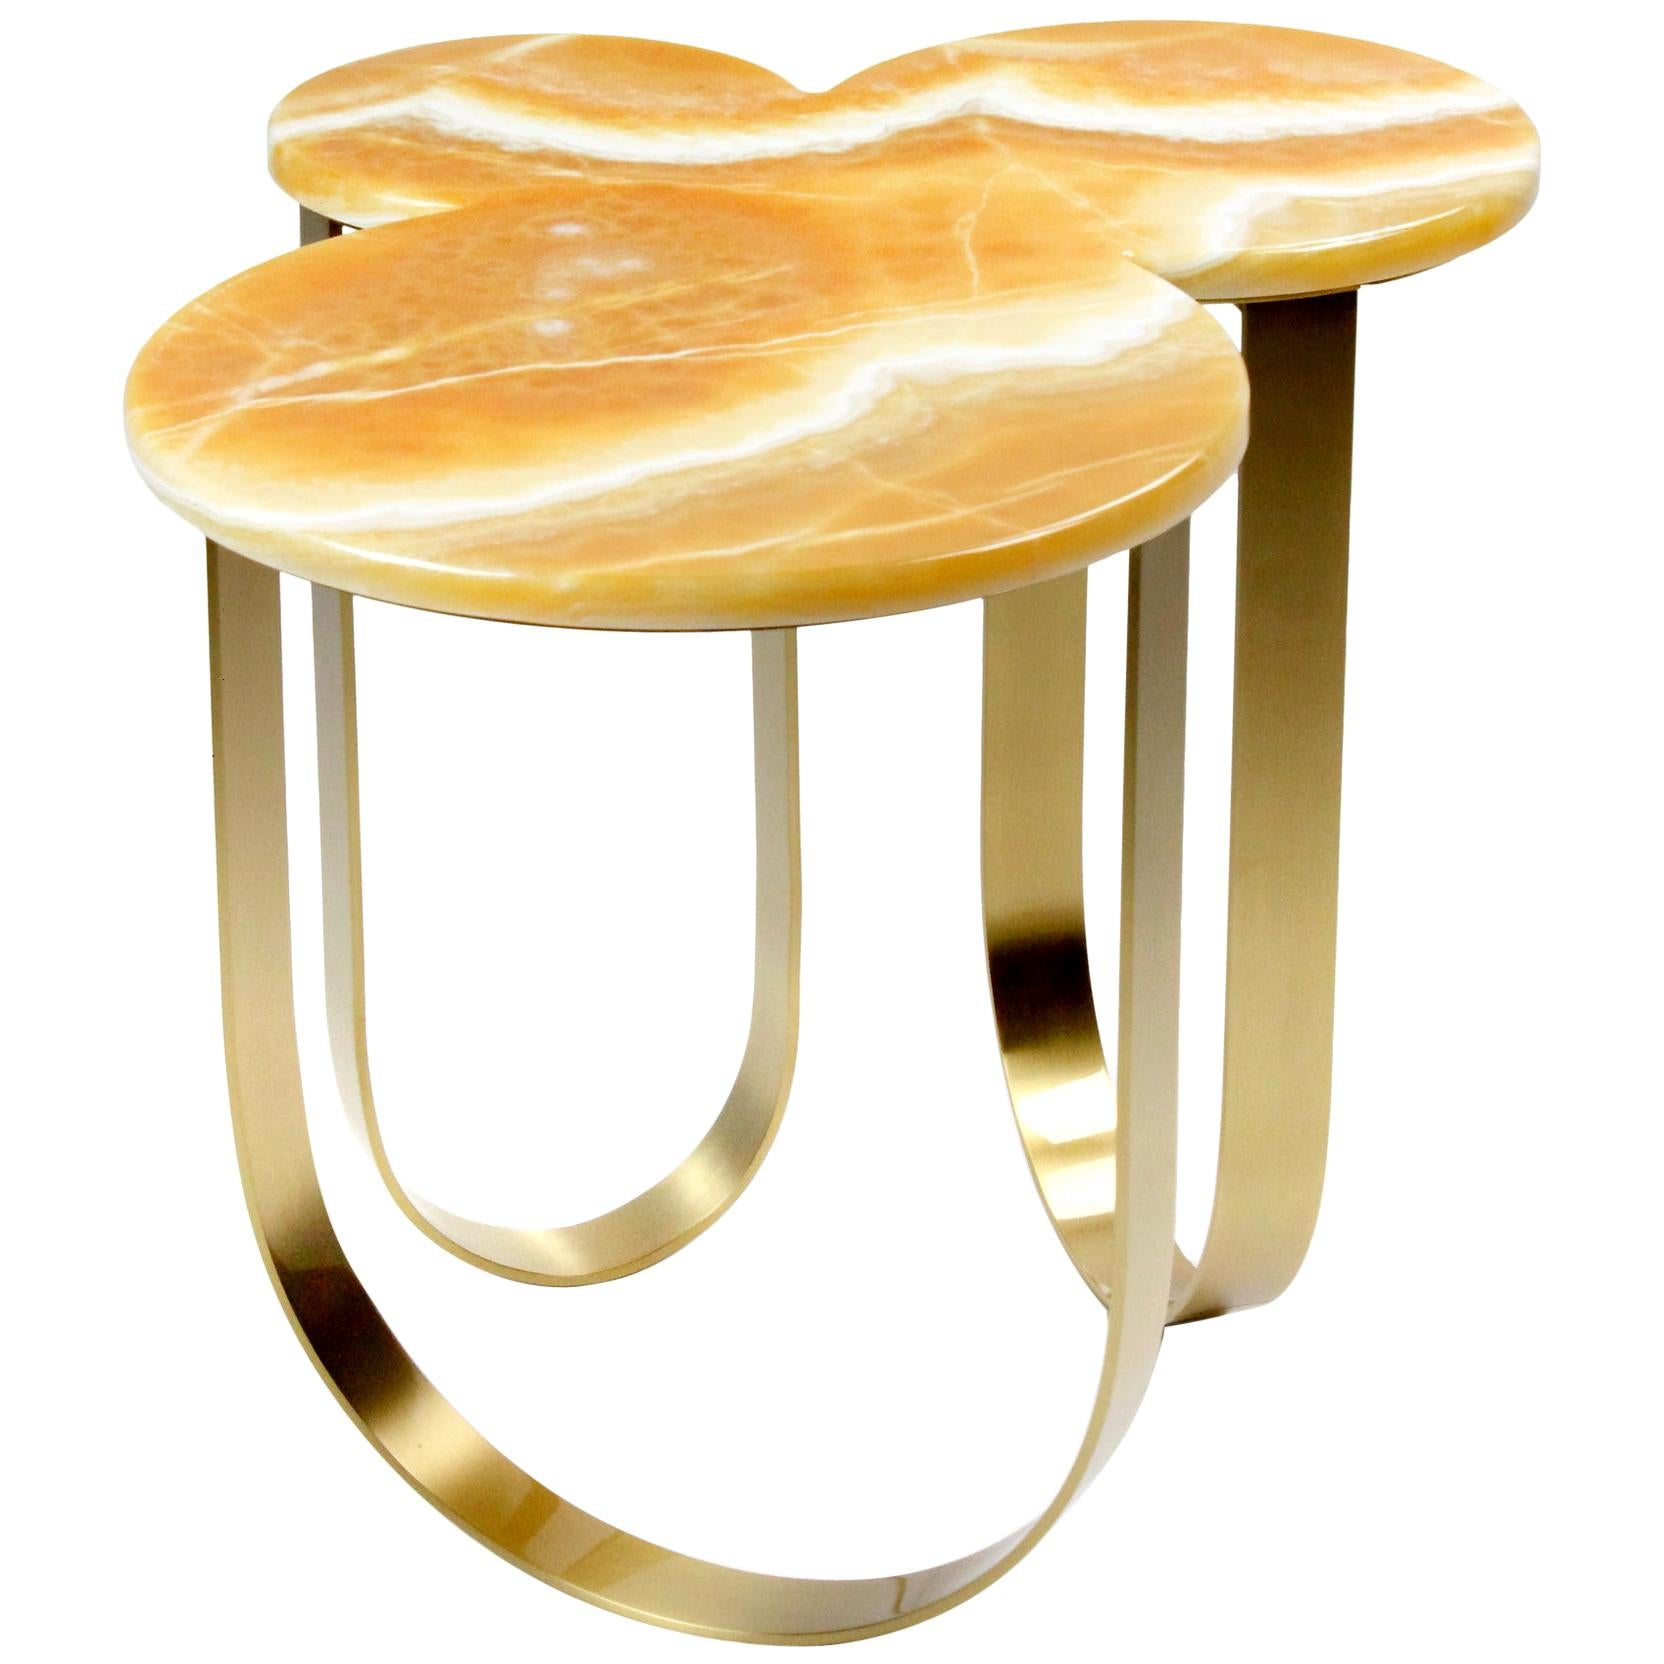 Side Table Modern Orange Onyx Brass Italian Limited Edition Design